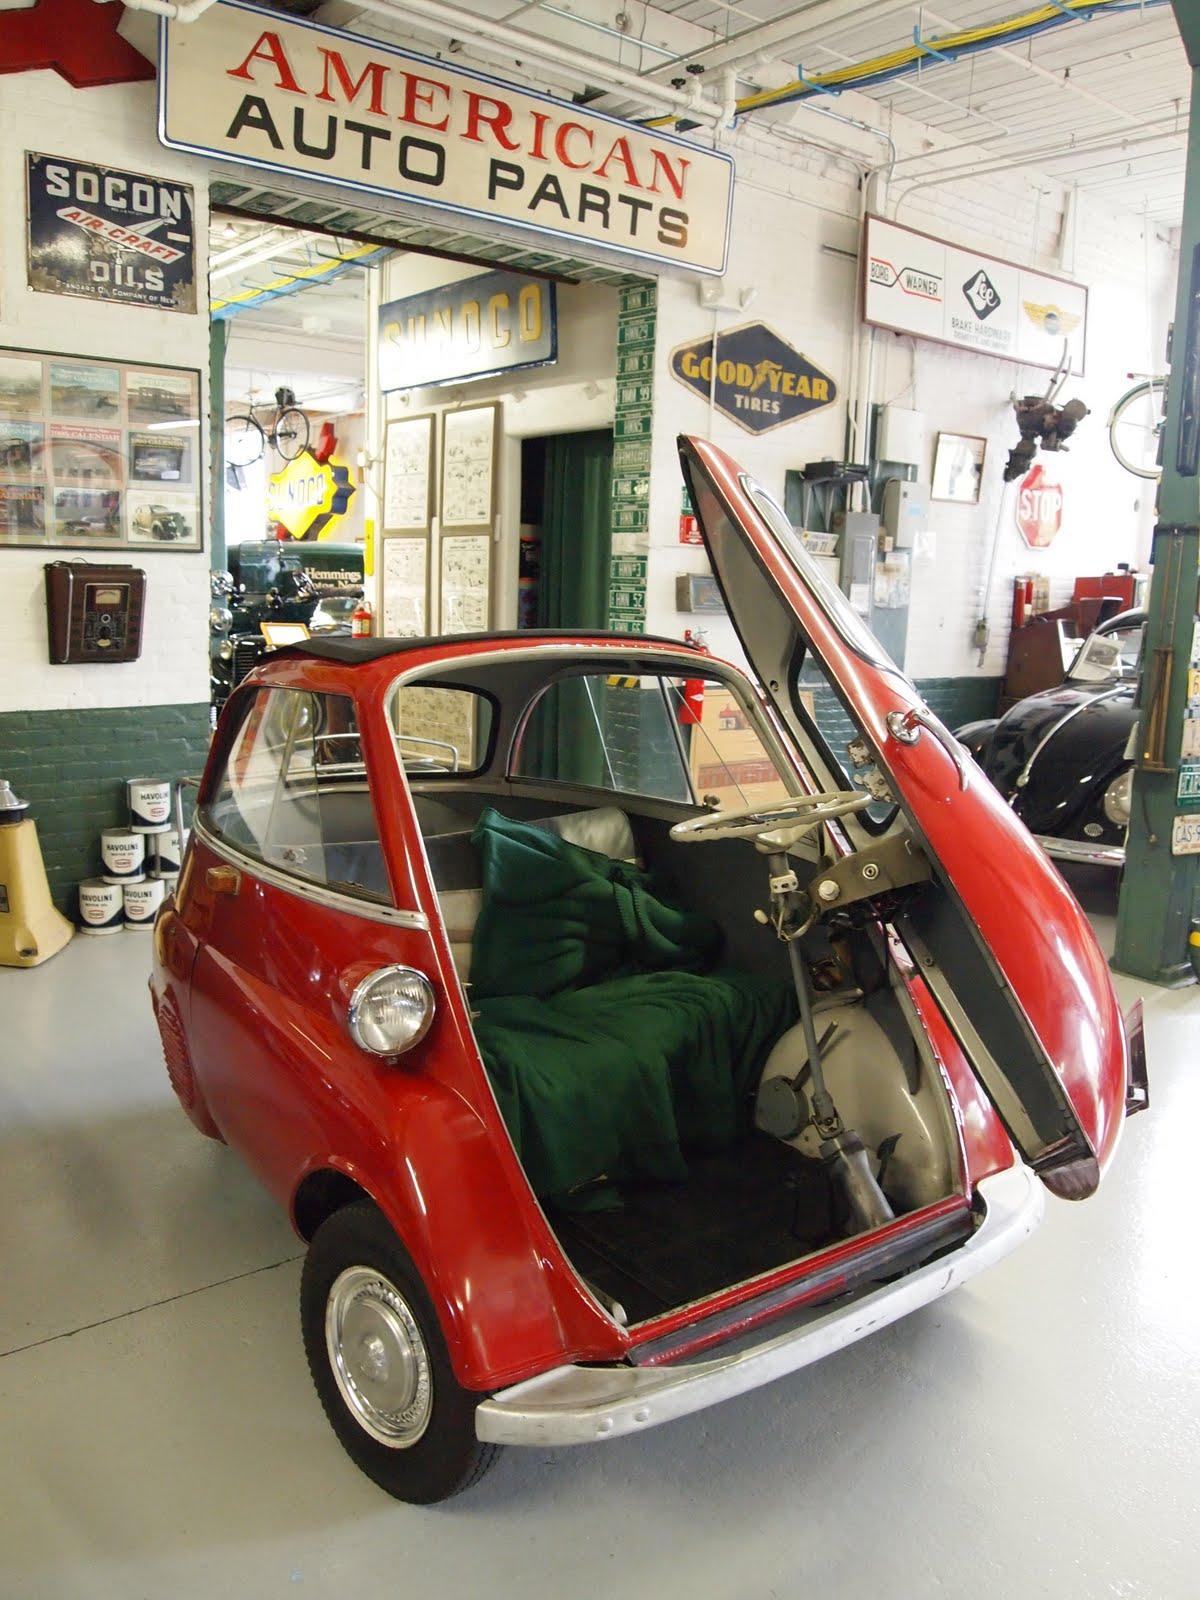 Heinkel Scooter Project: Hemmings Auto Museum